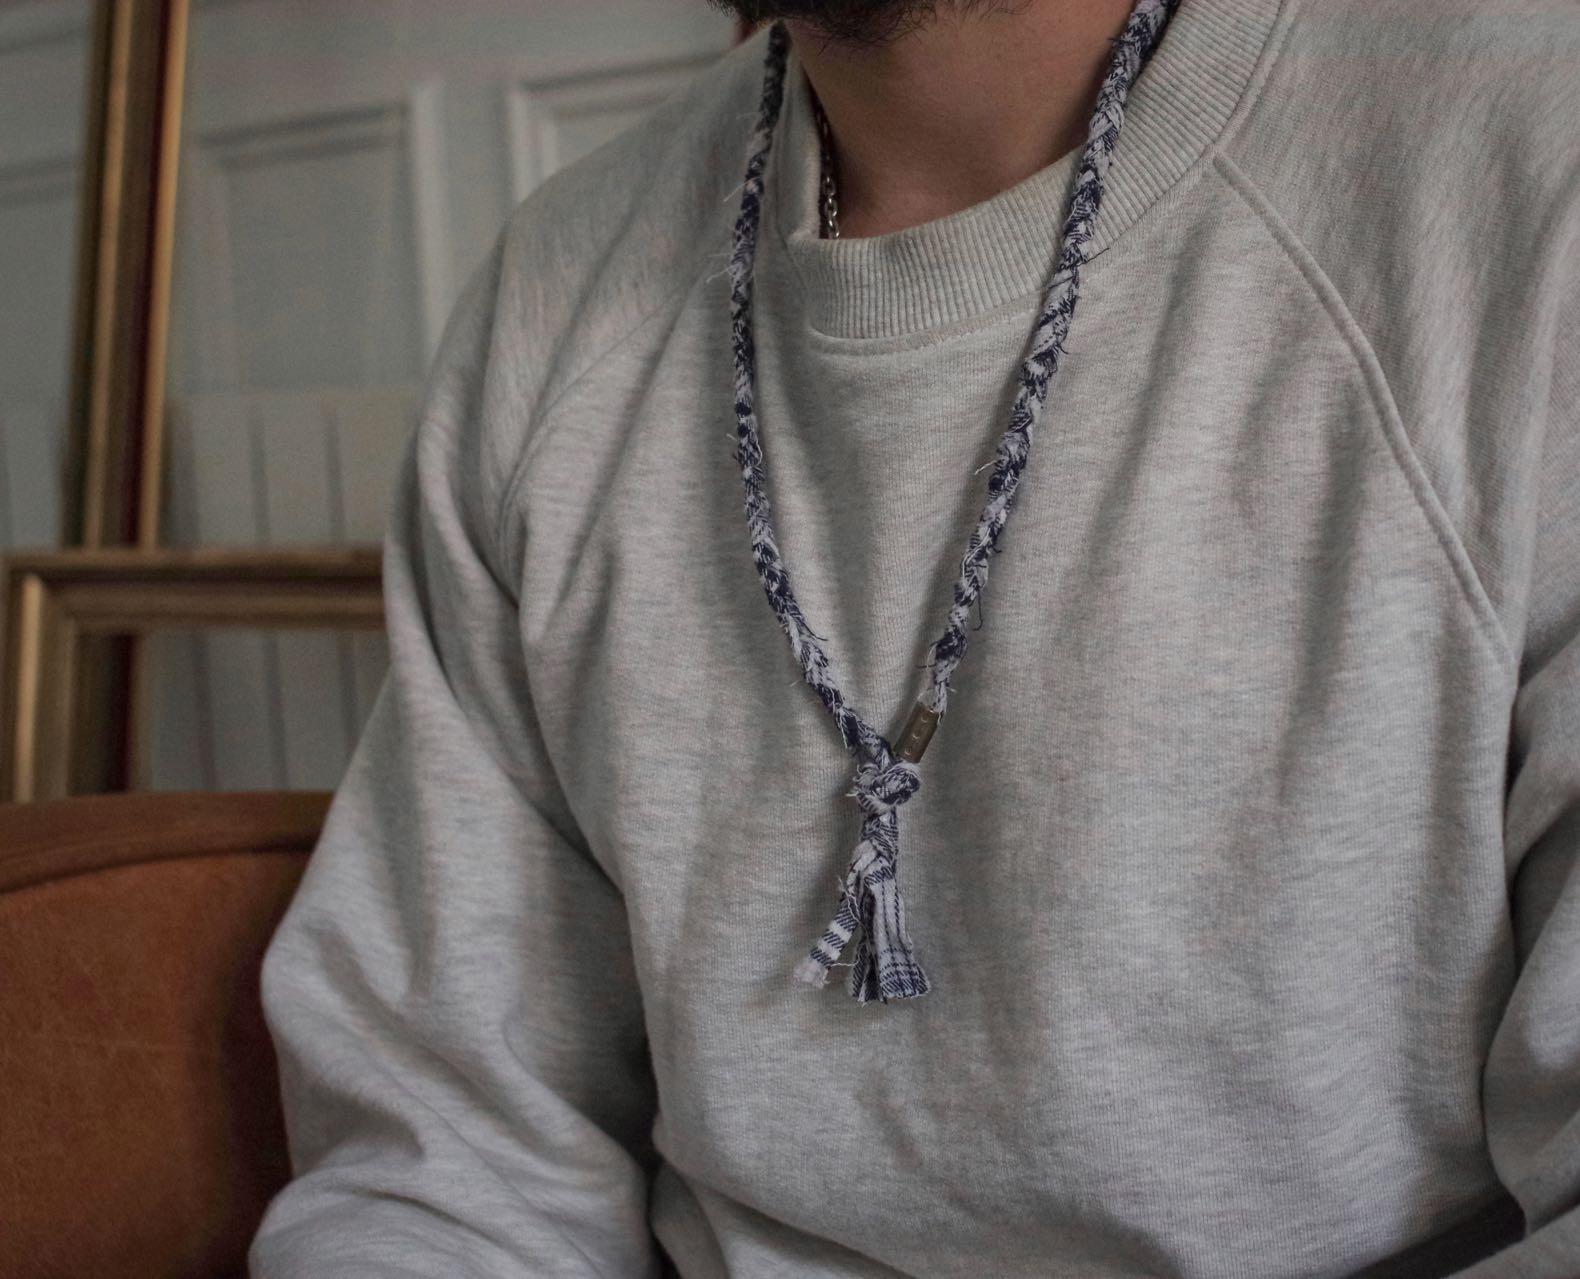 sweat-shirt gris type sportswear vintage et inspiration militaie ) collier borali